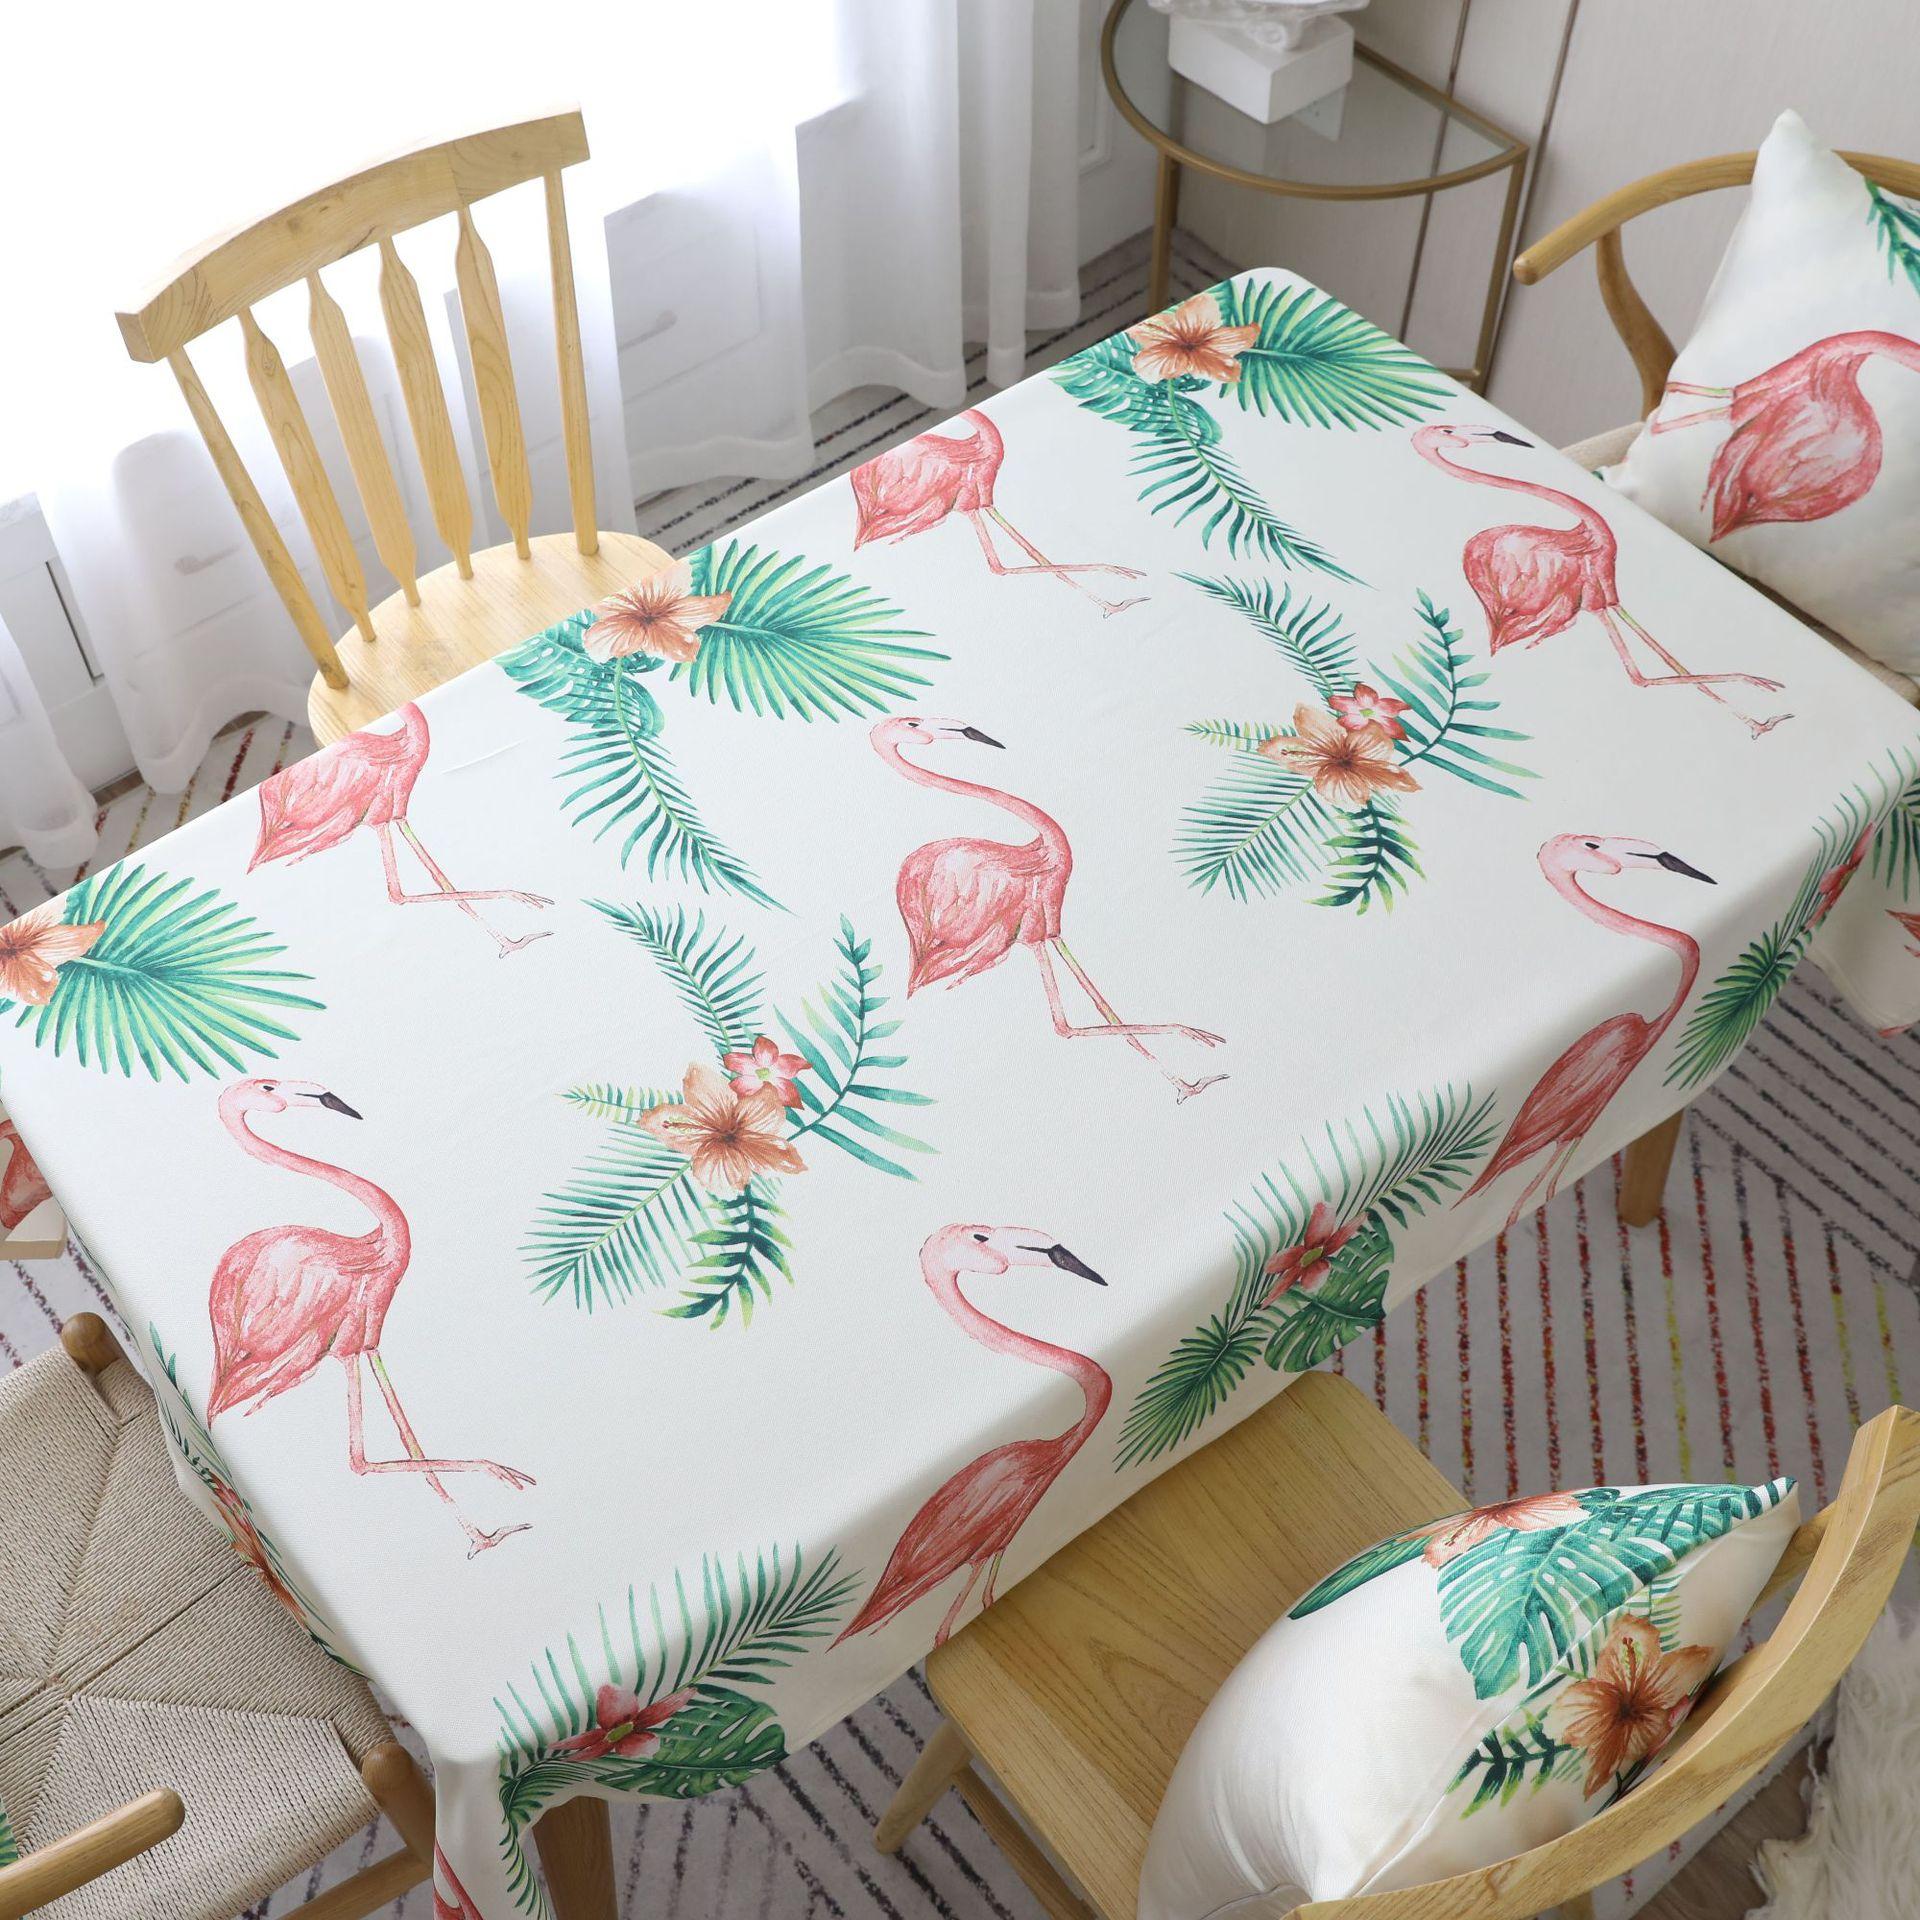 Mantel de mesa de Cactus de flamenco nórdico, mantel grueso Rectangular de café, mantel de gran oferta de 140x220cm, mantel para mesa